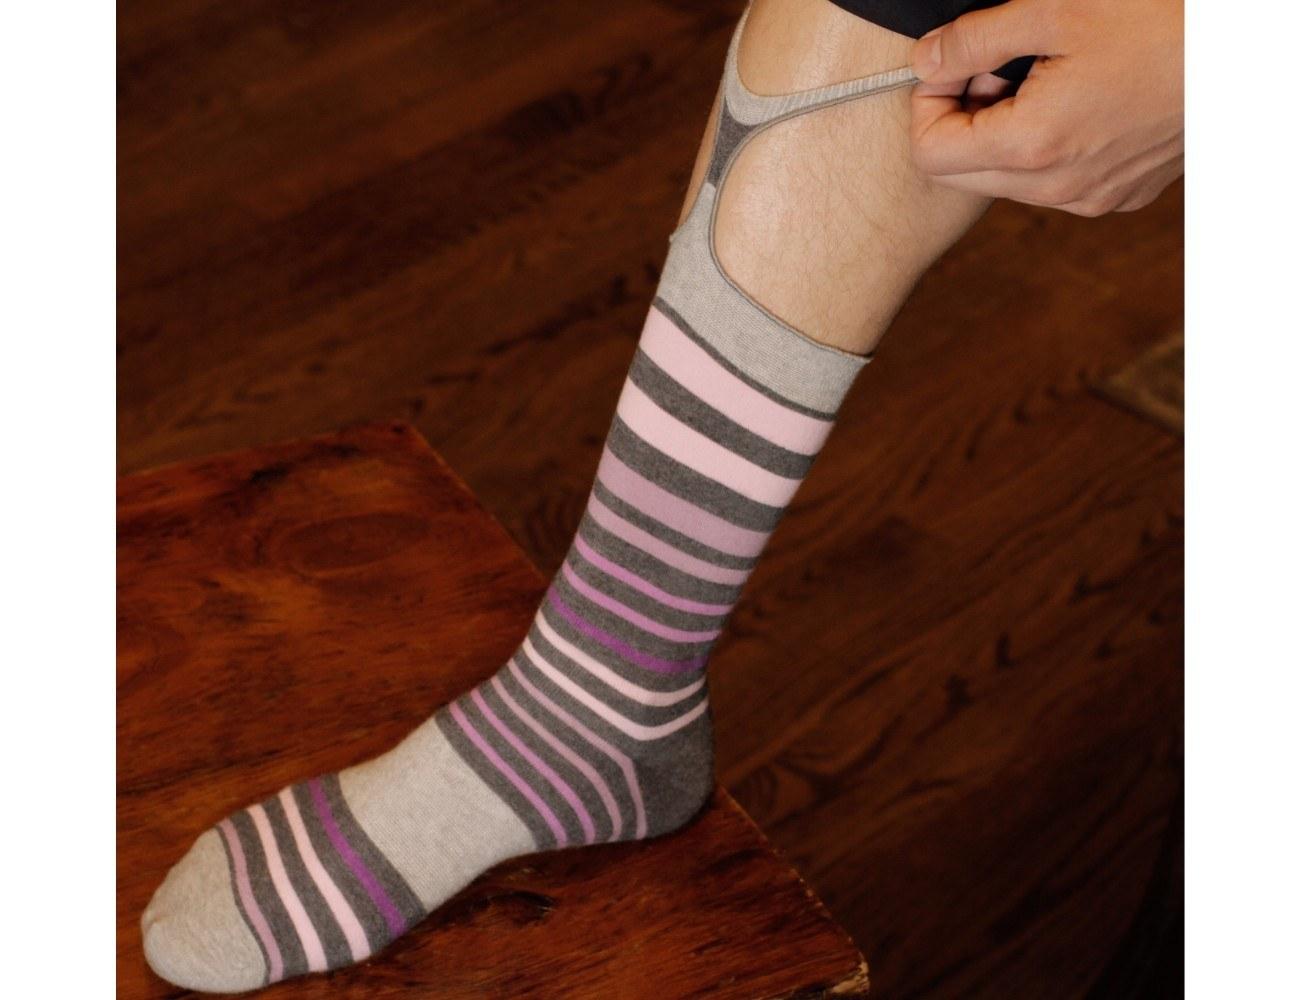 Lasso Socks Anti-Sagging Socks